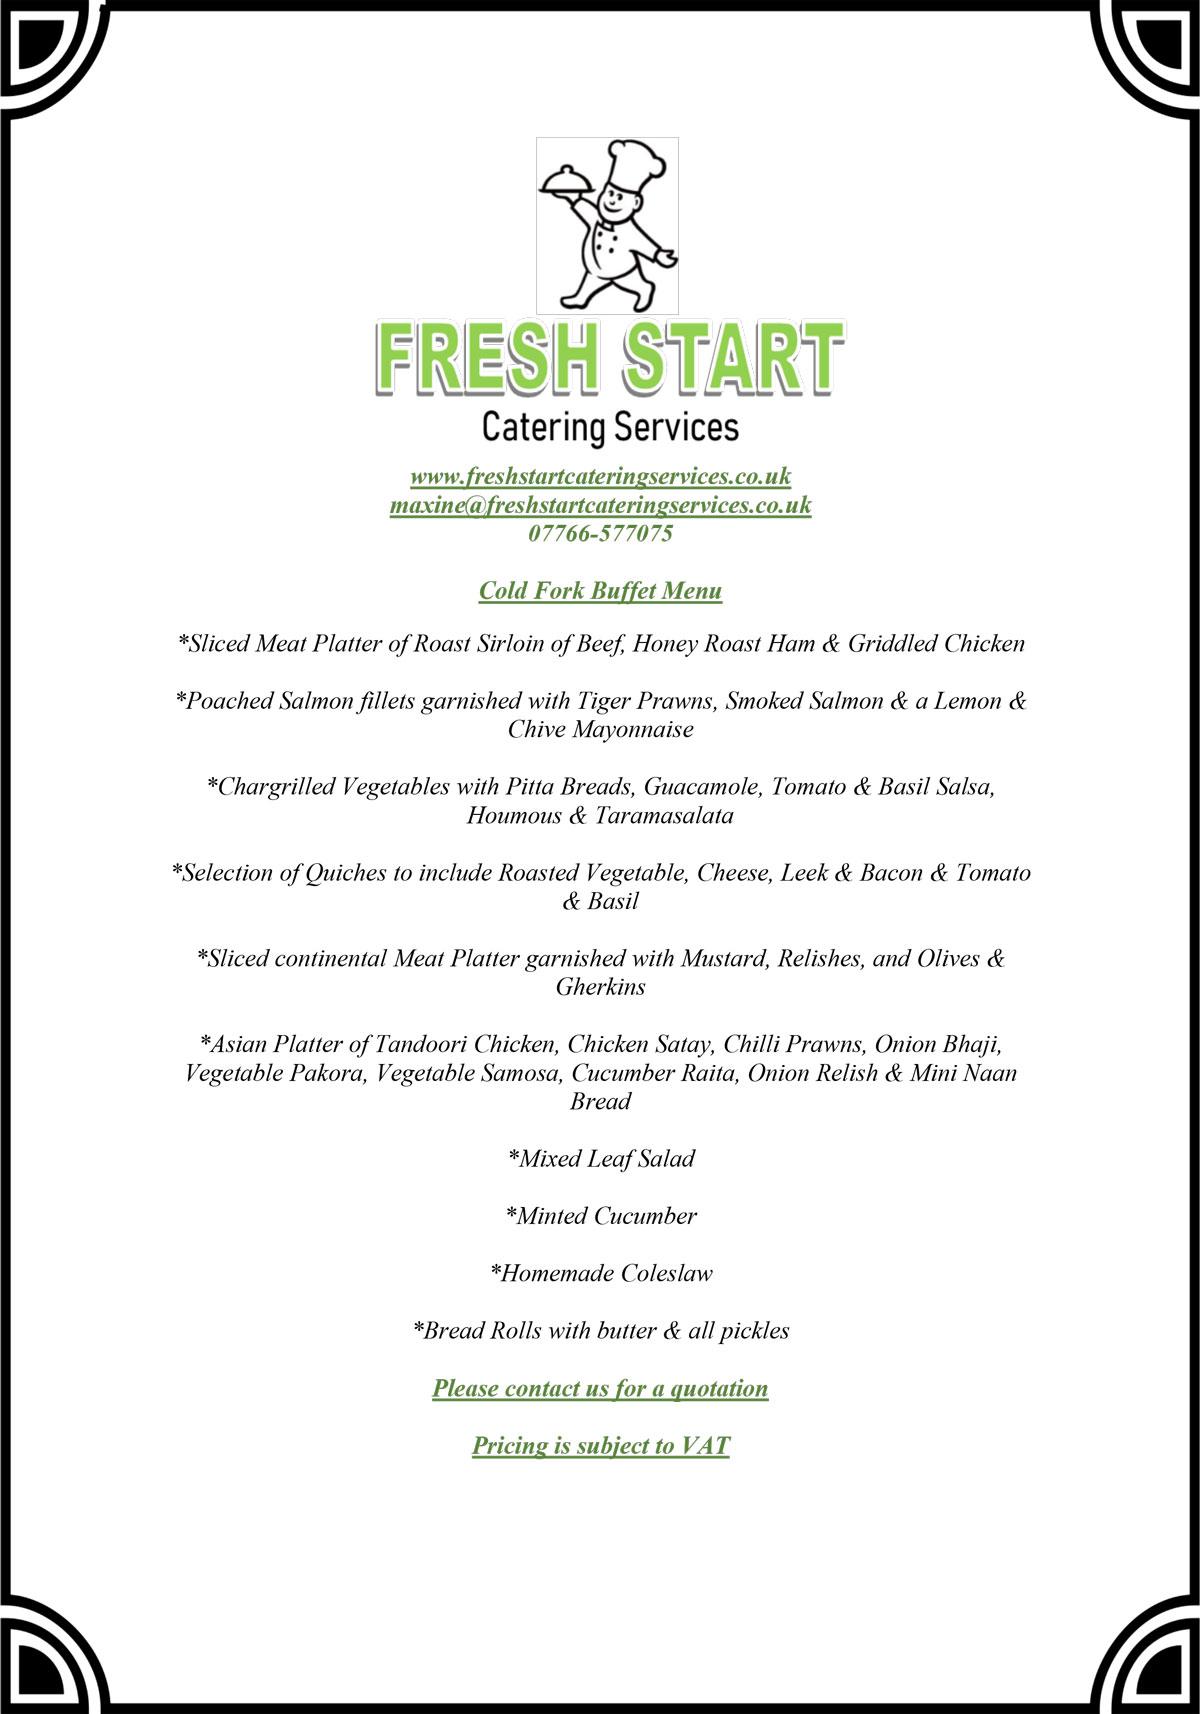 FSCS cold fork buffet menu